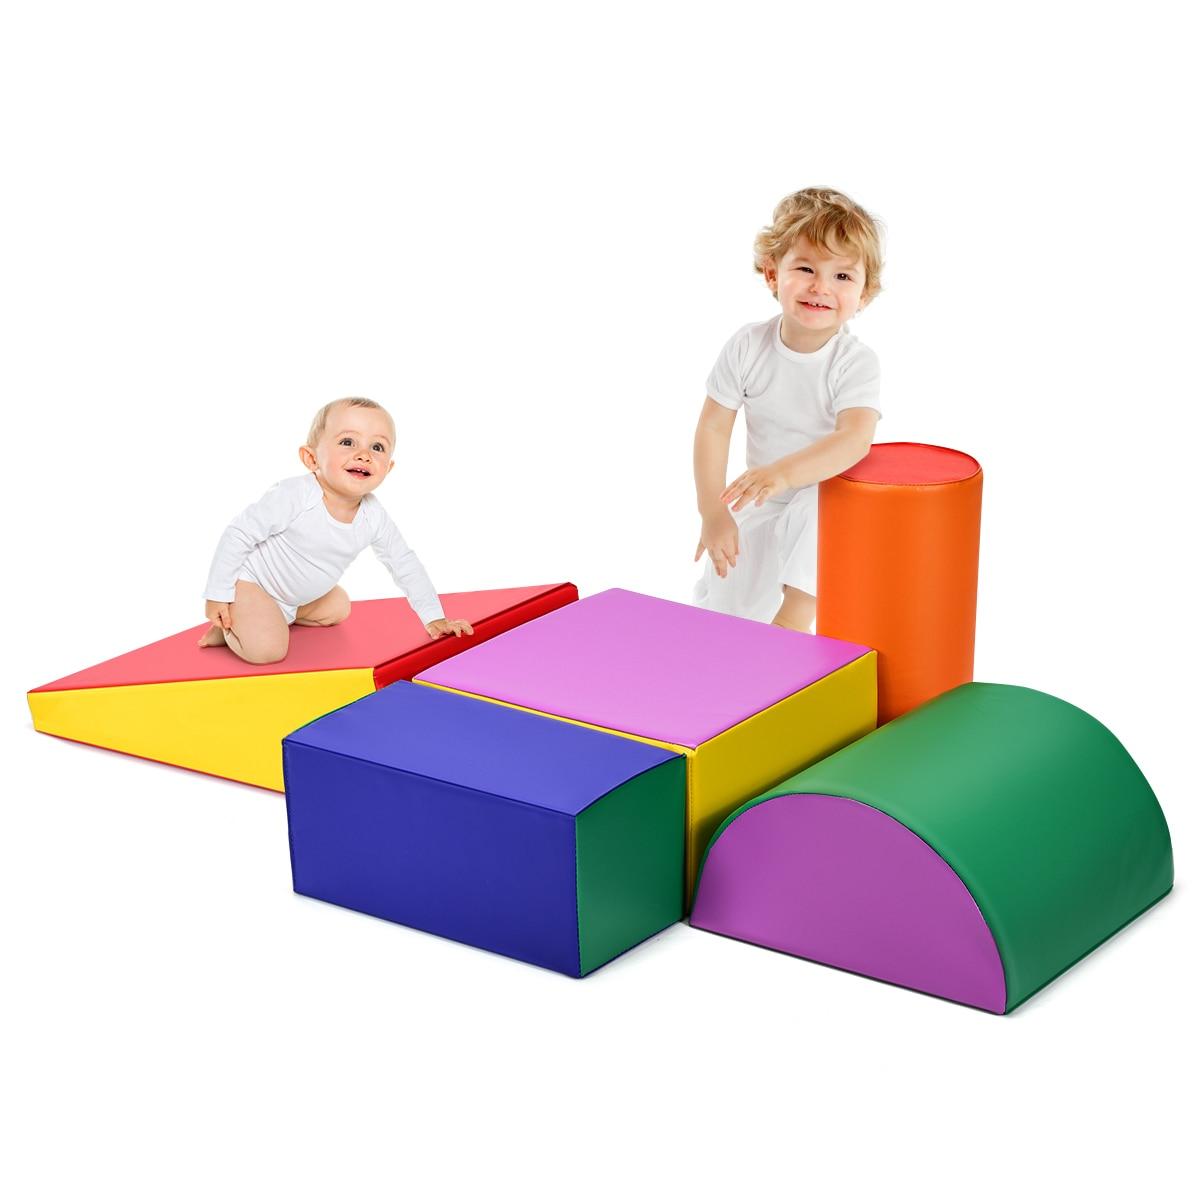 Kids Play Foam Set Toddlers Crawl Foam Shapes Set Climb Slide Safe Active Play